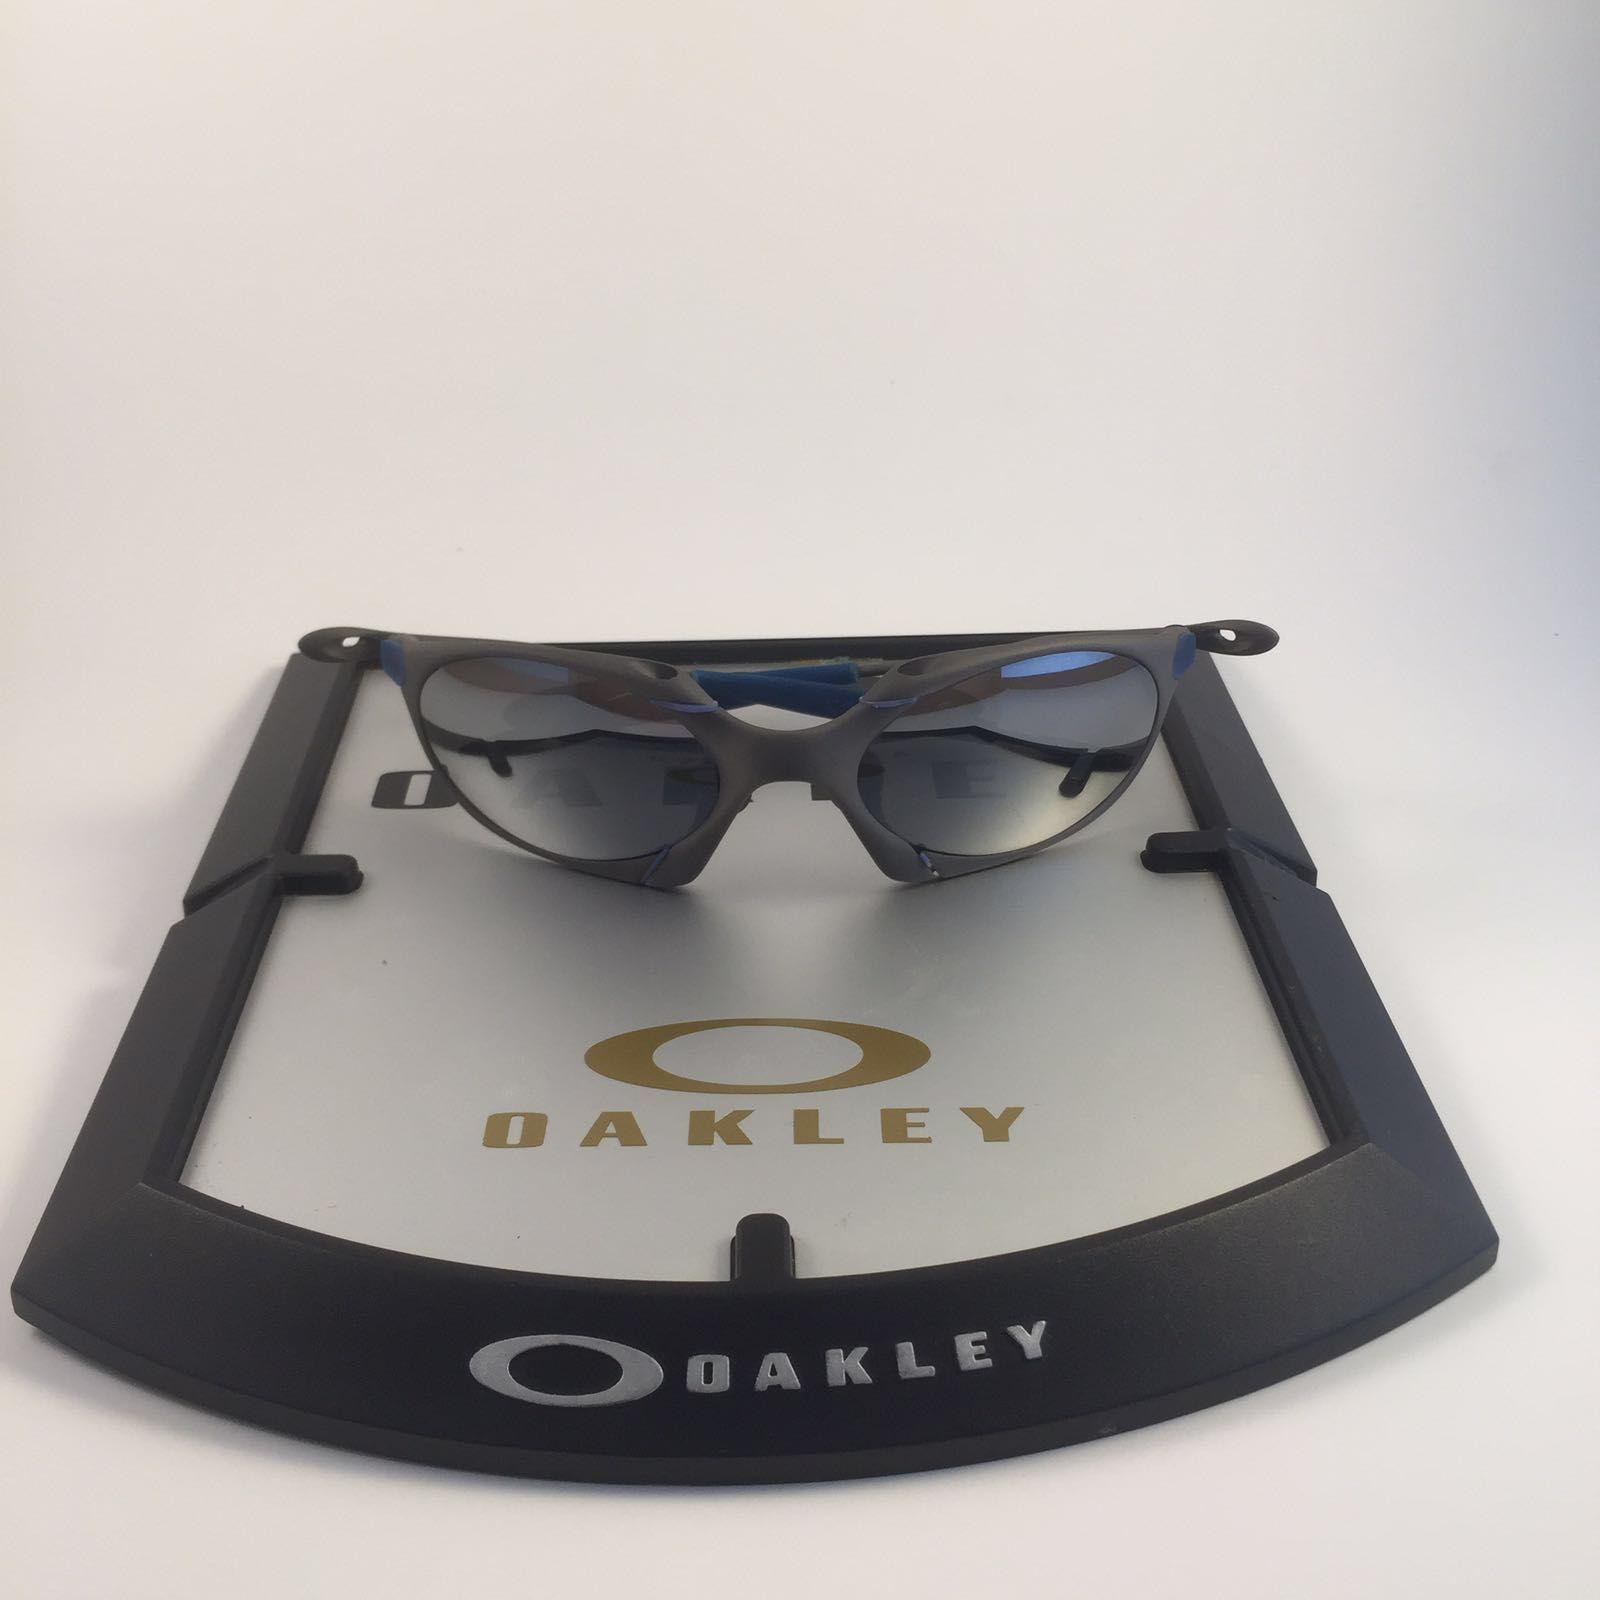 oakley romeo 1 x metal - bac4e576-6ef4-47c5-a69d-5e8a2152b20a.jpeg